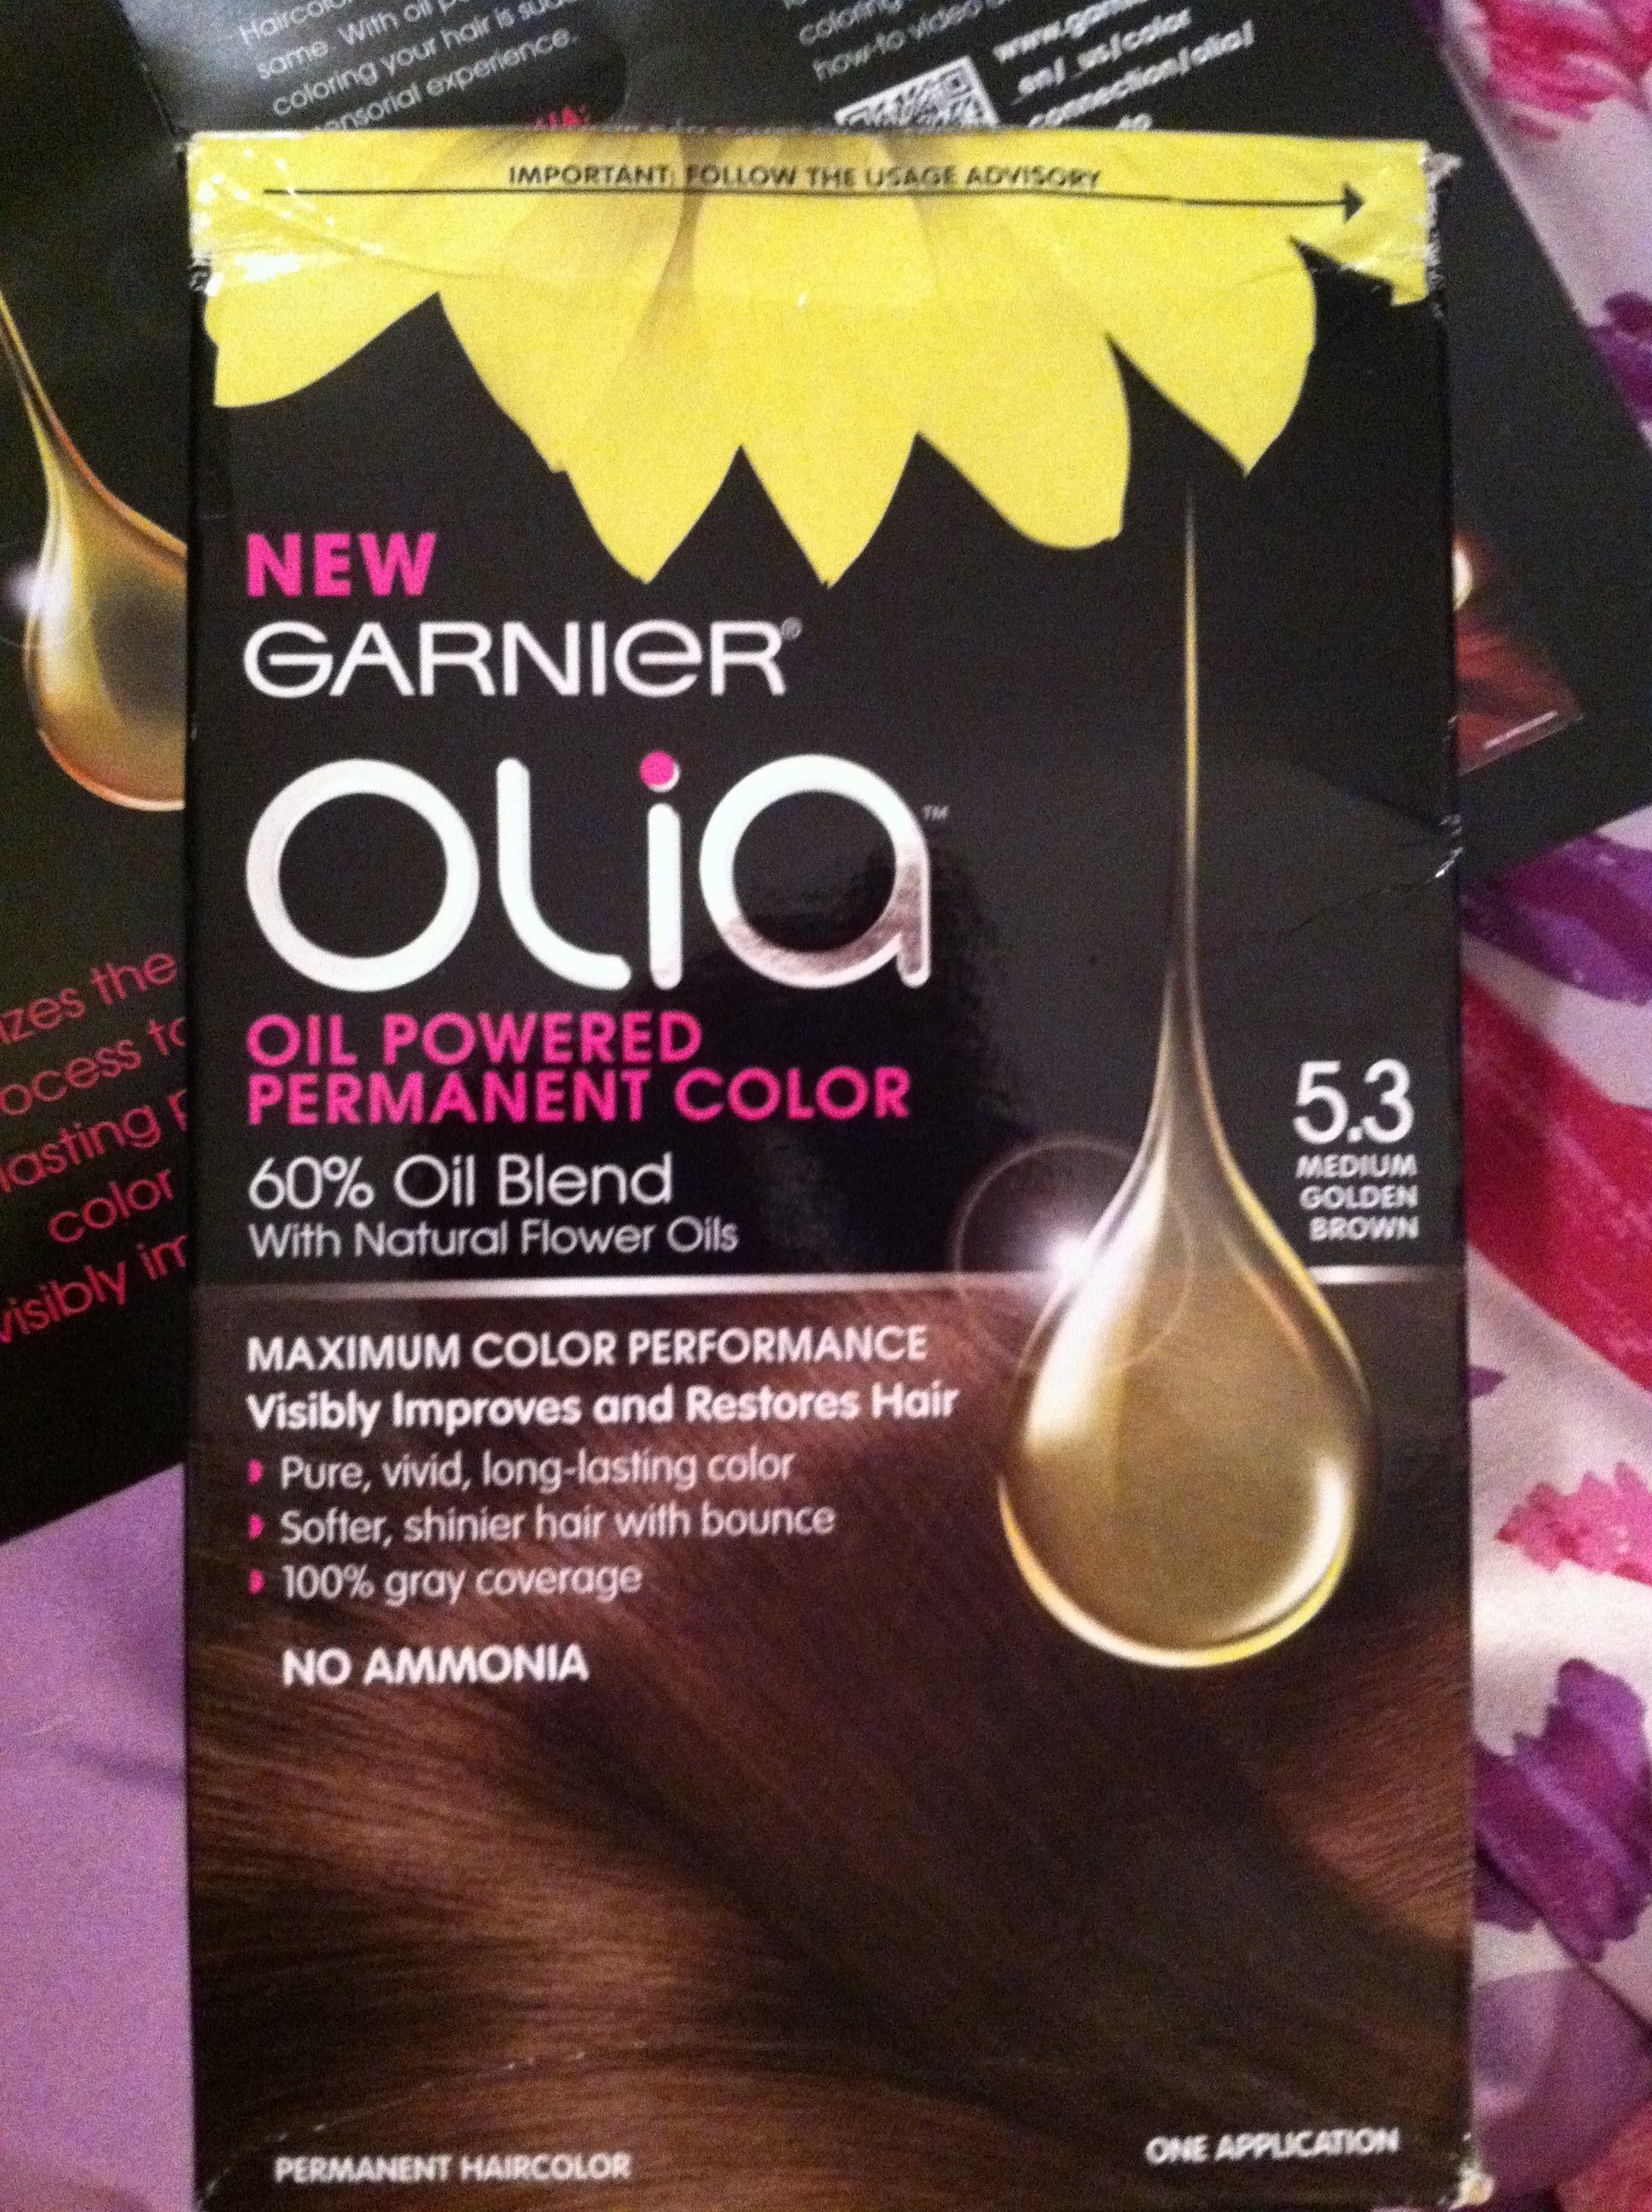 I Chose The 5 3 Medium Golden Brown Garnier Olia Hair Color I